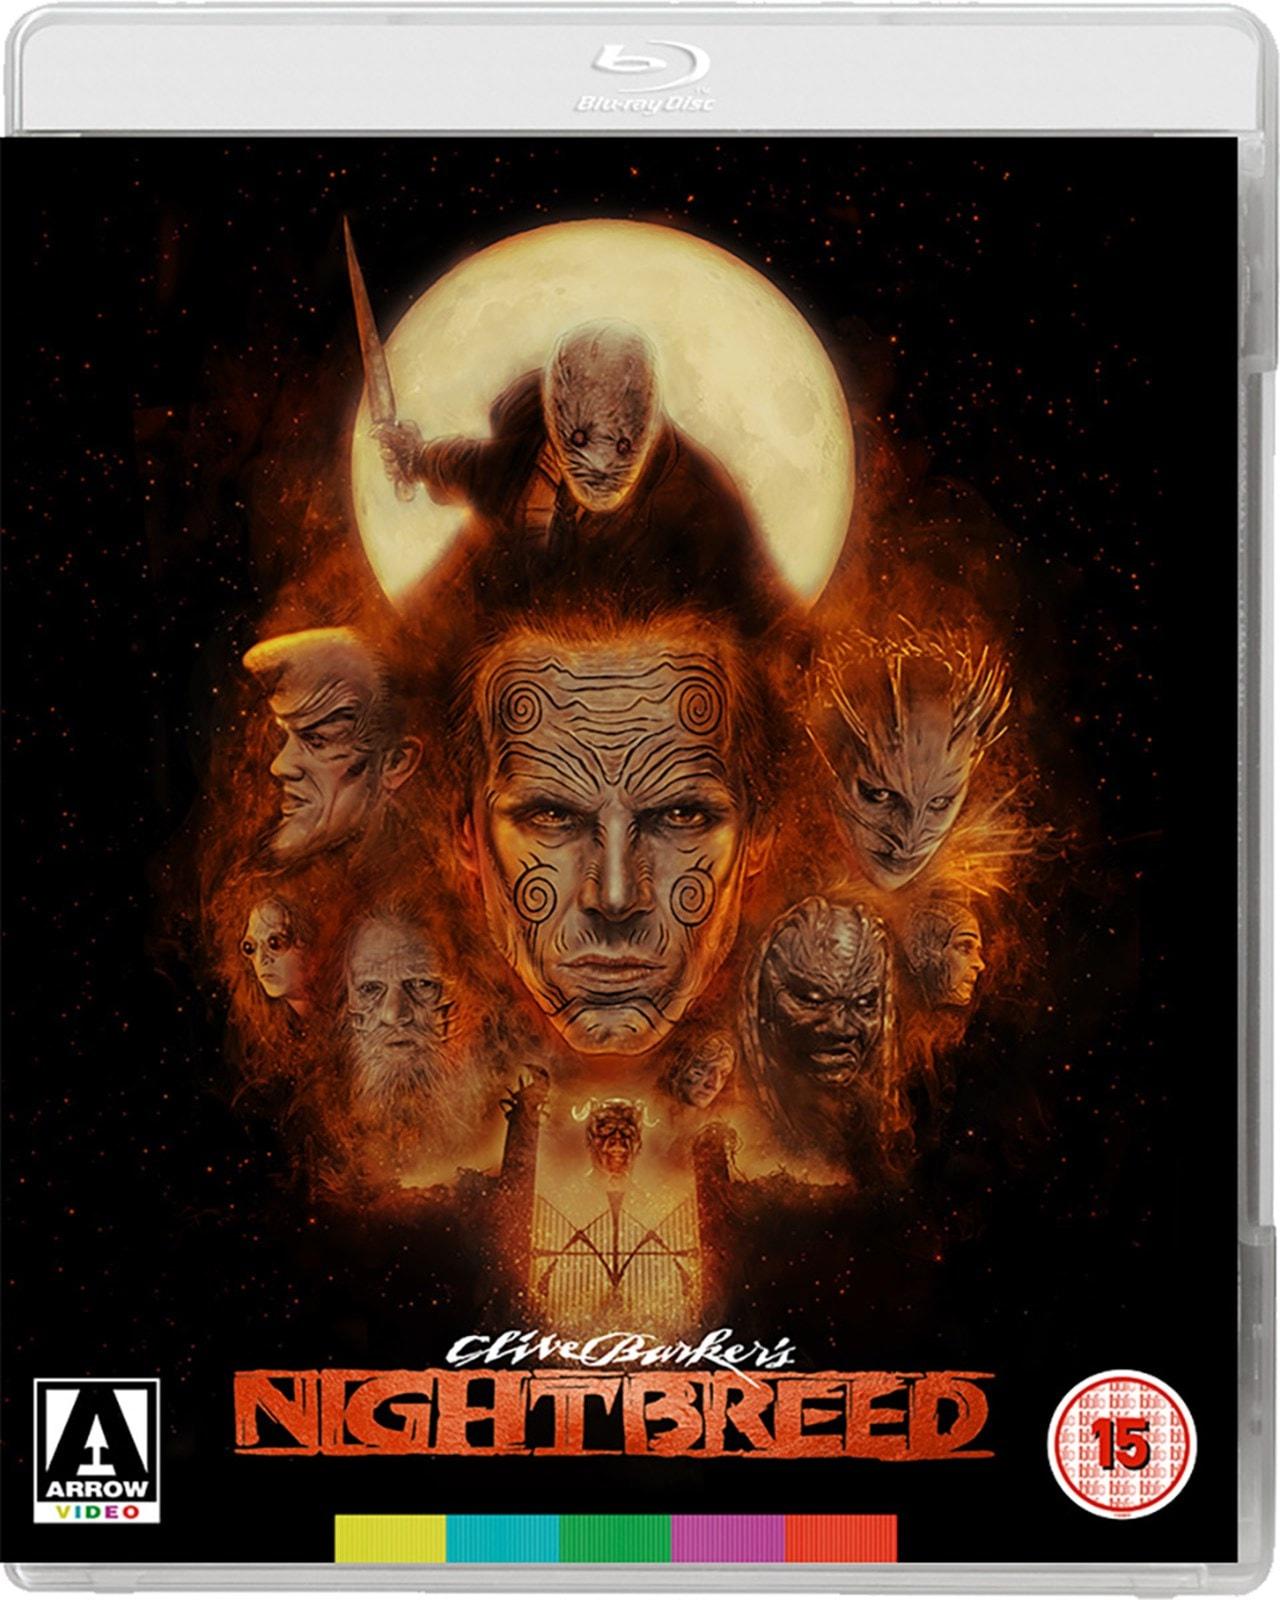 Nightbreed - 1